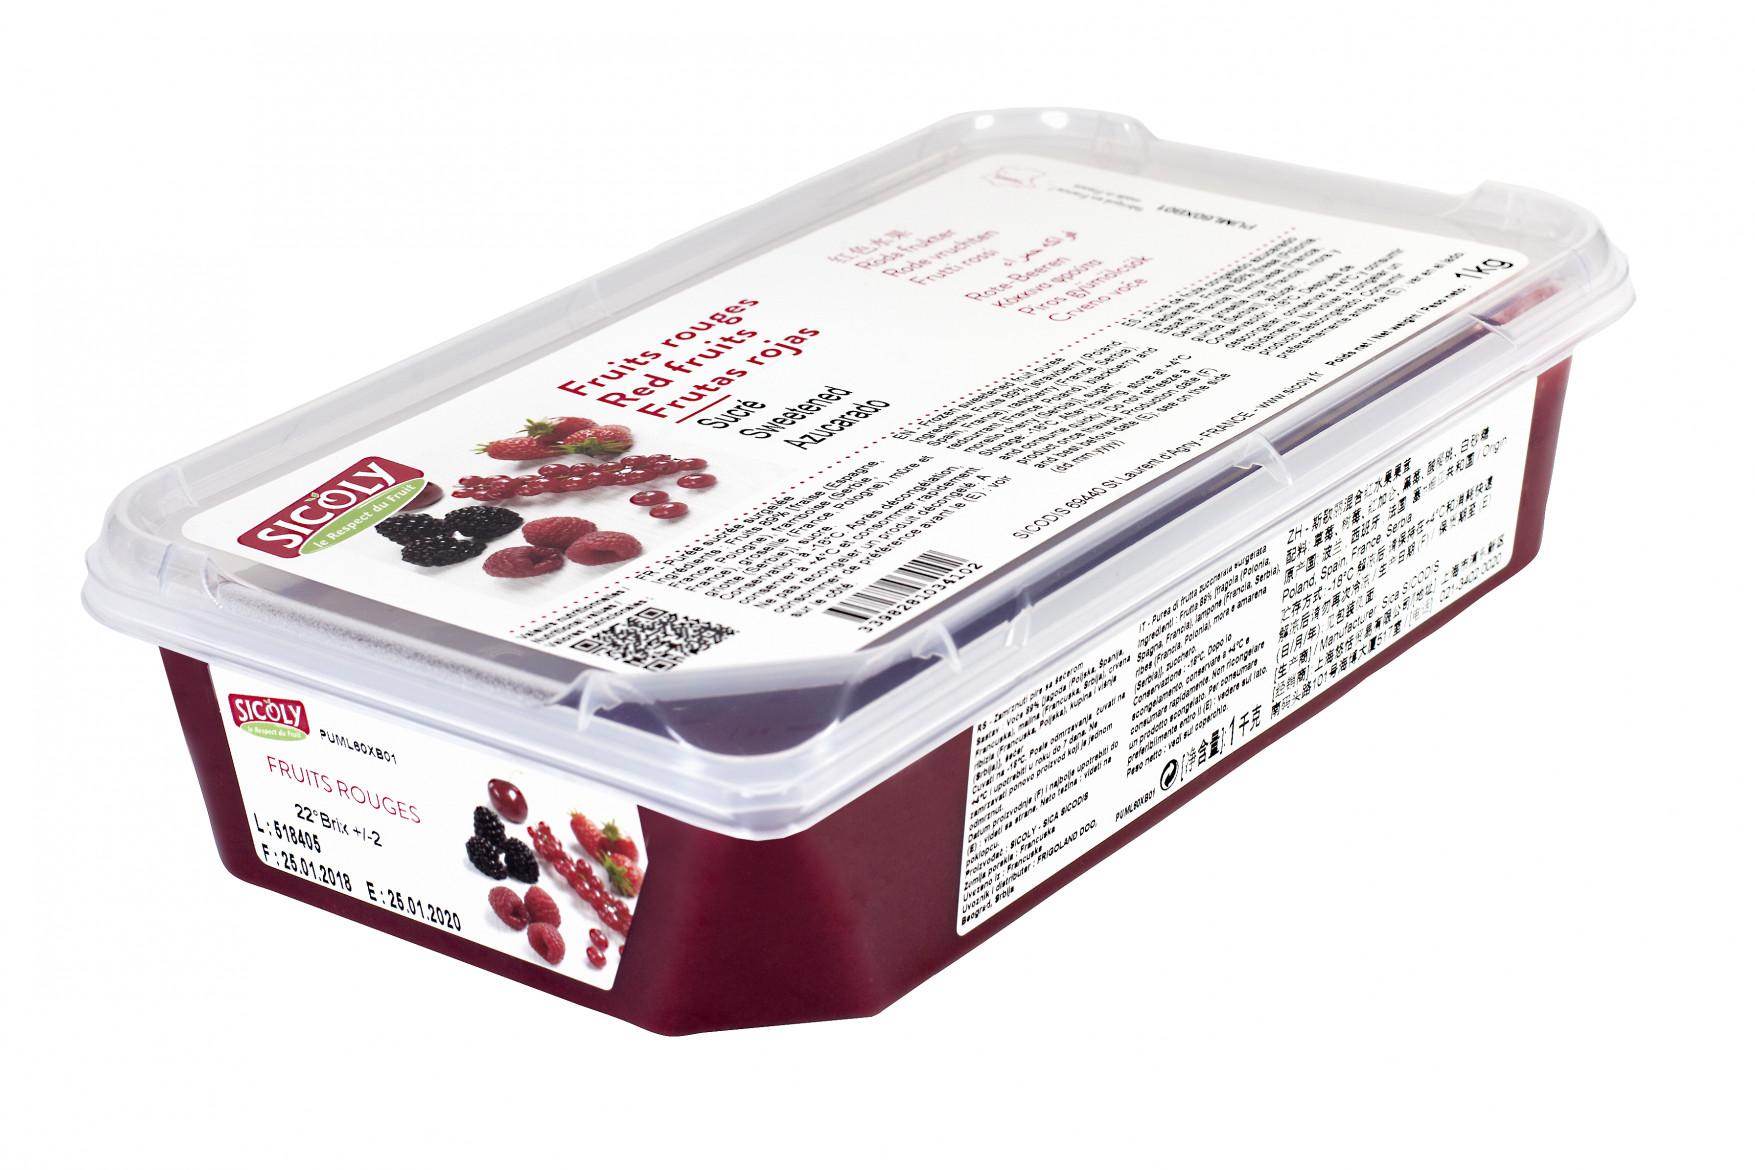 Piure de mix de fructe rosii, 1kg, Sicoly